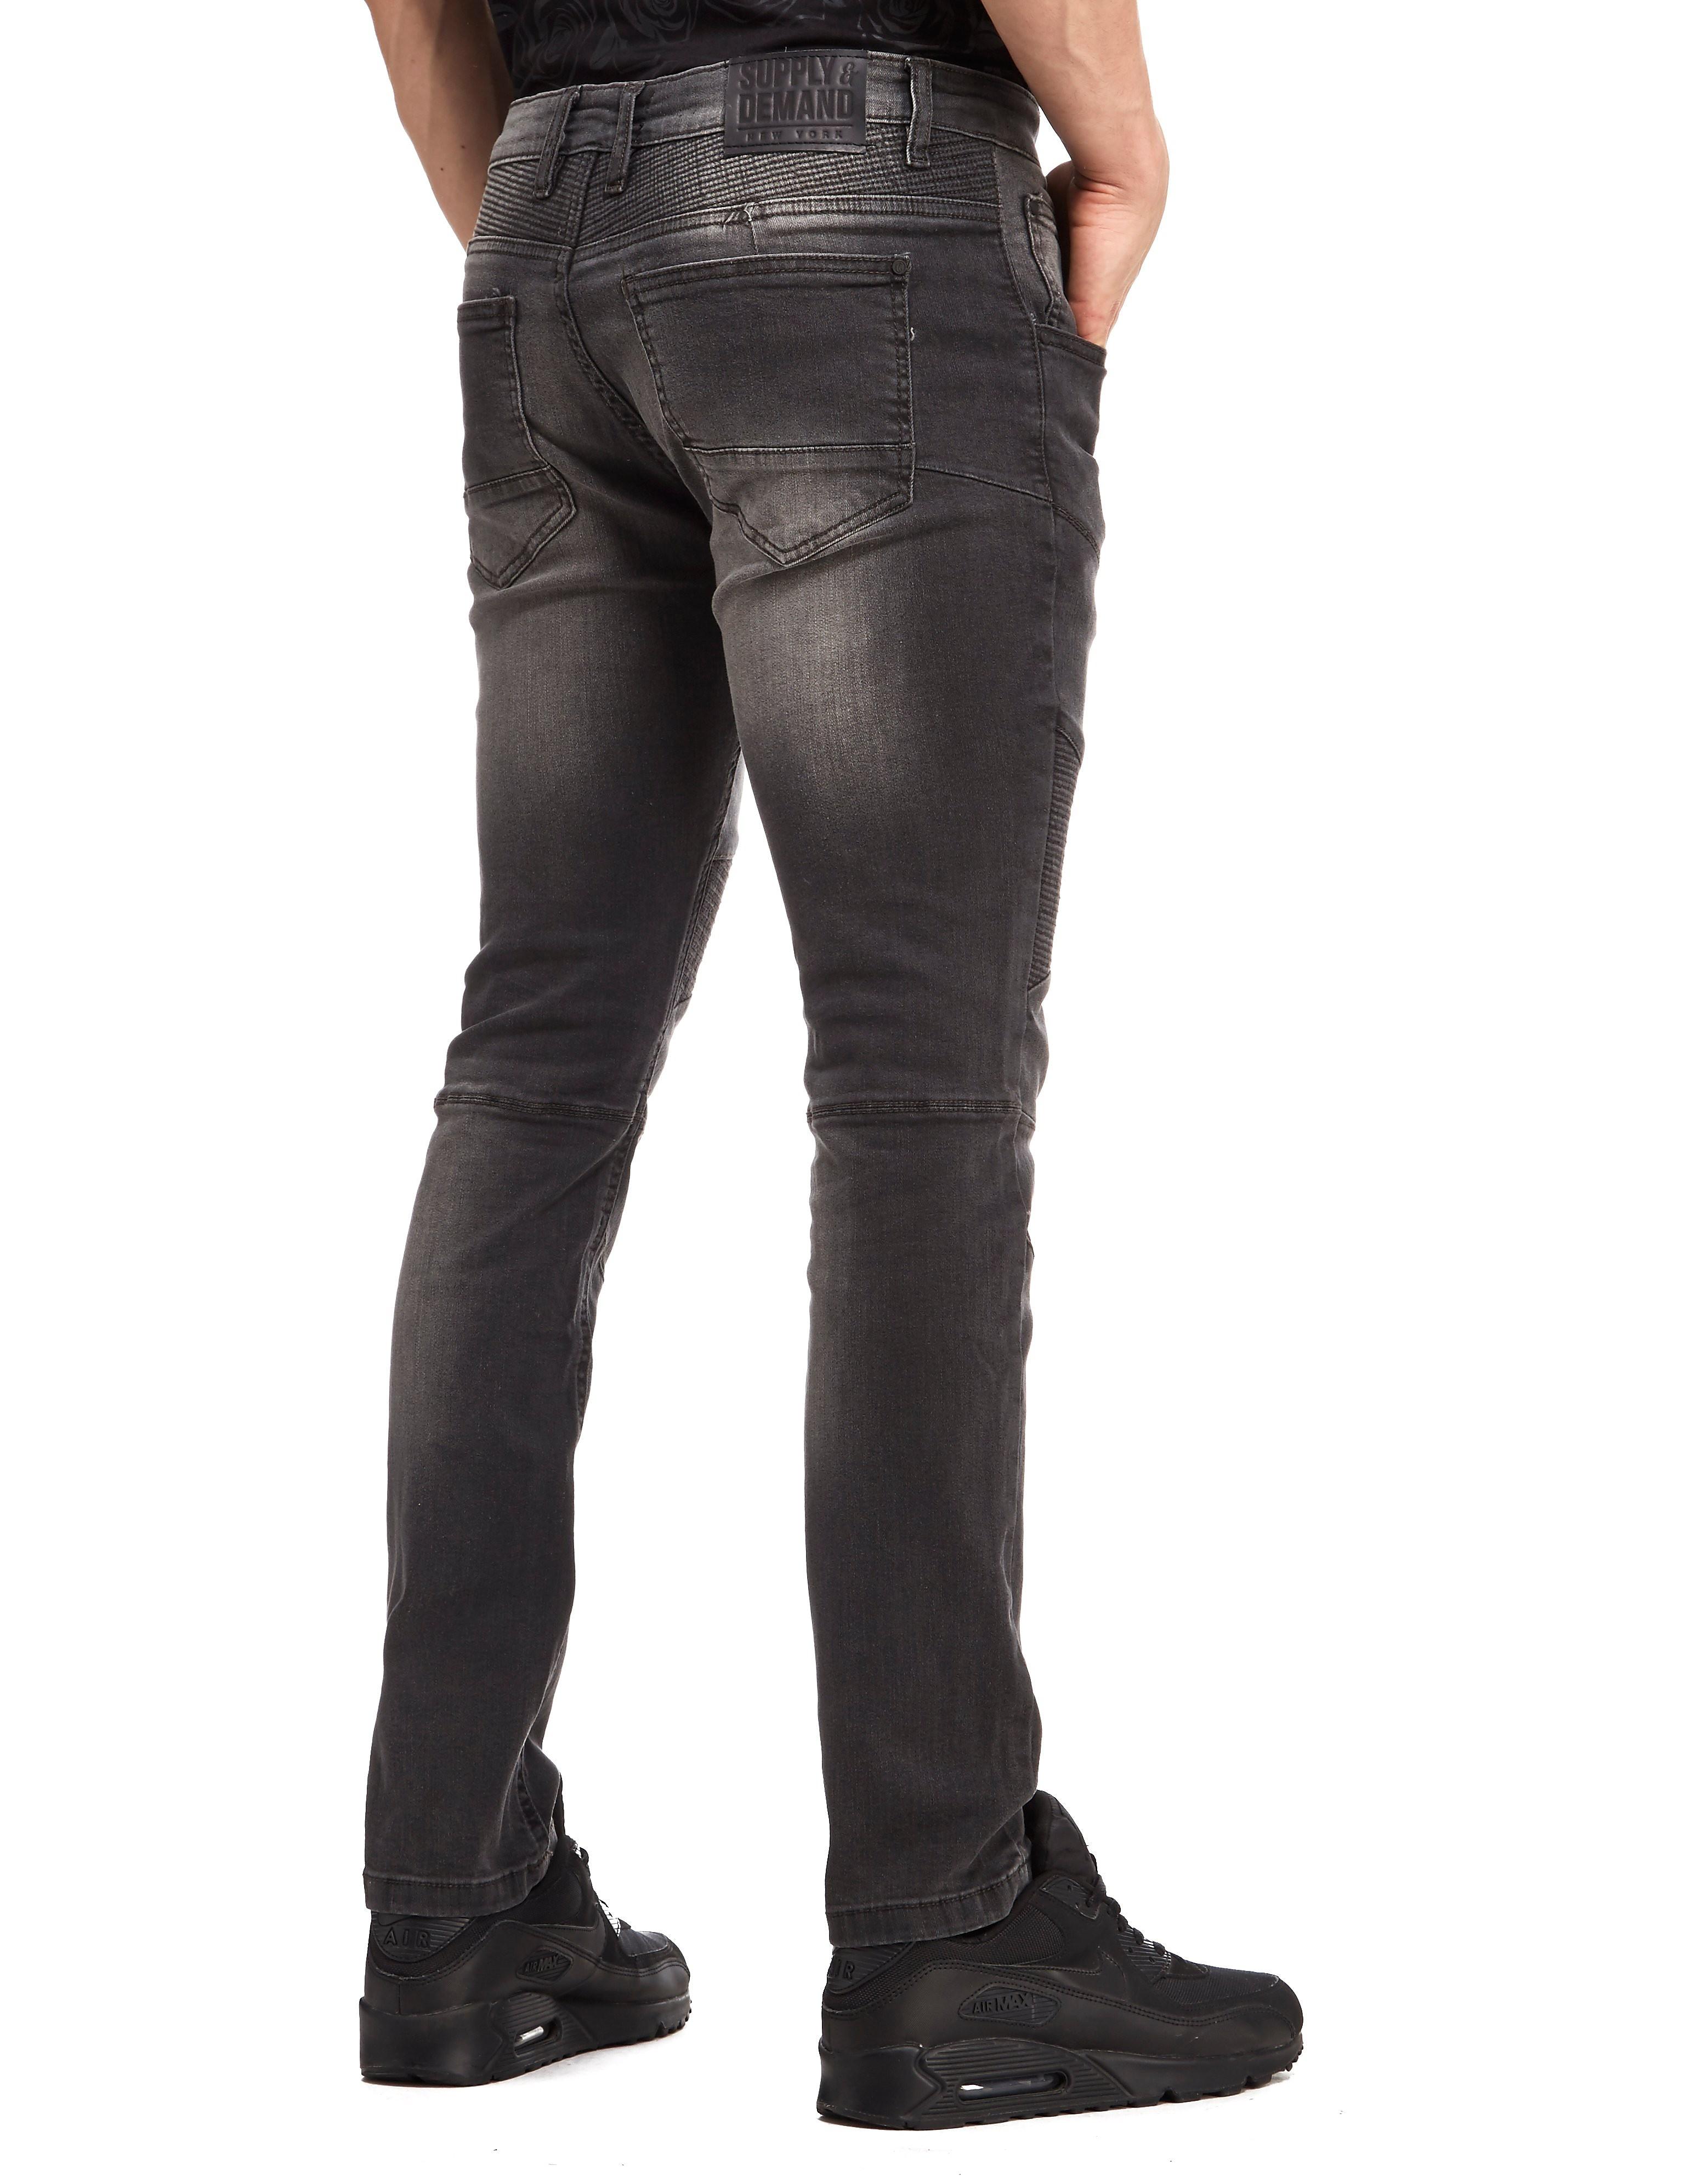 Supply & Demand Brooklyn Jeans